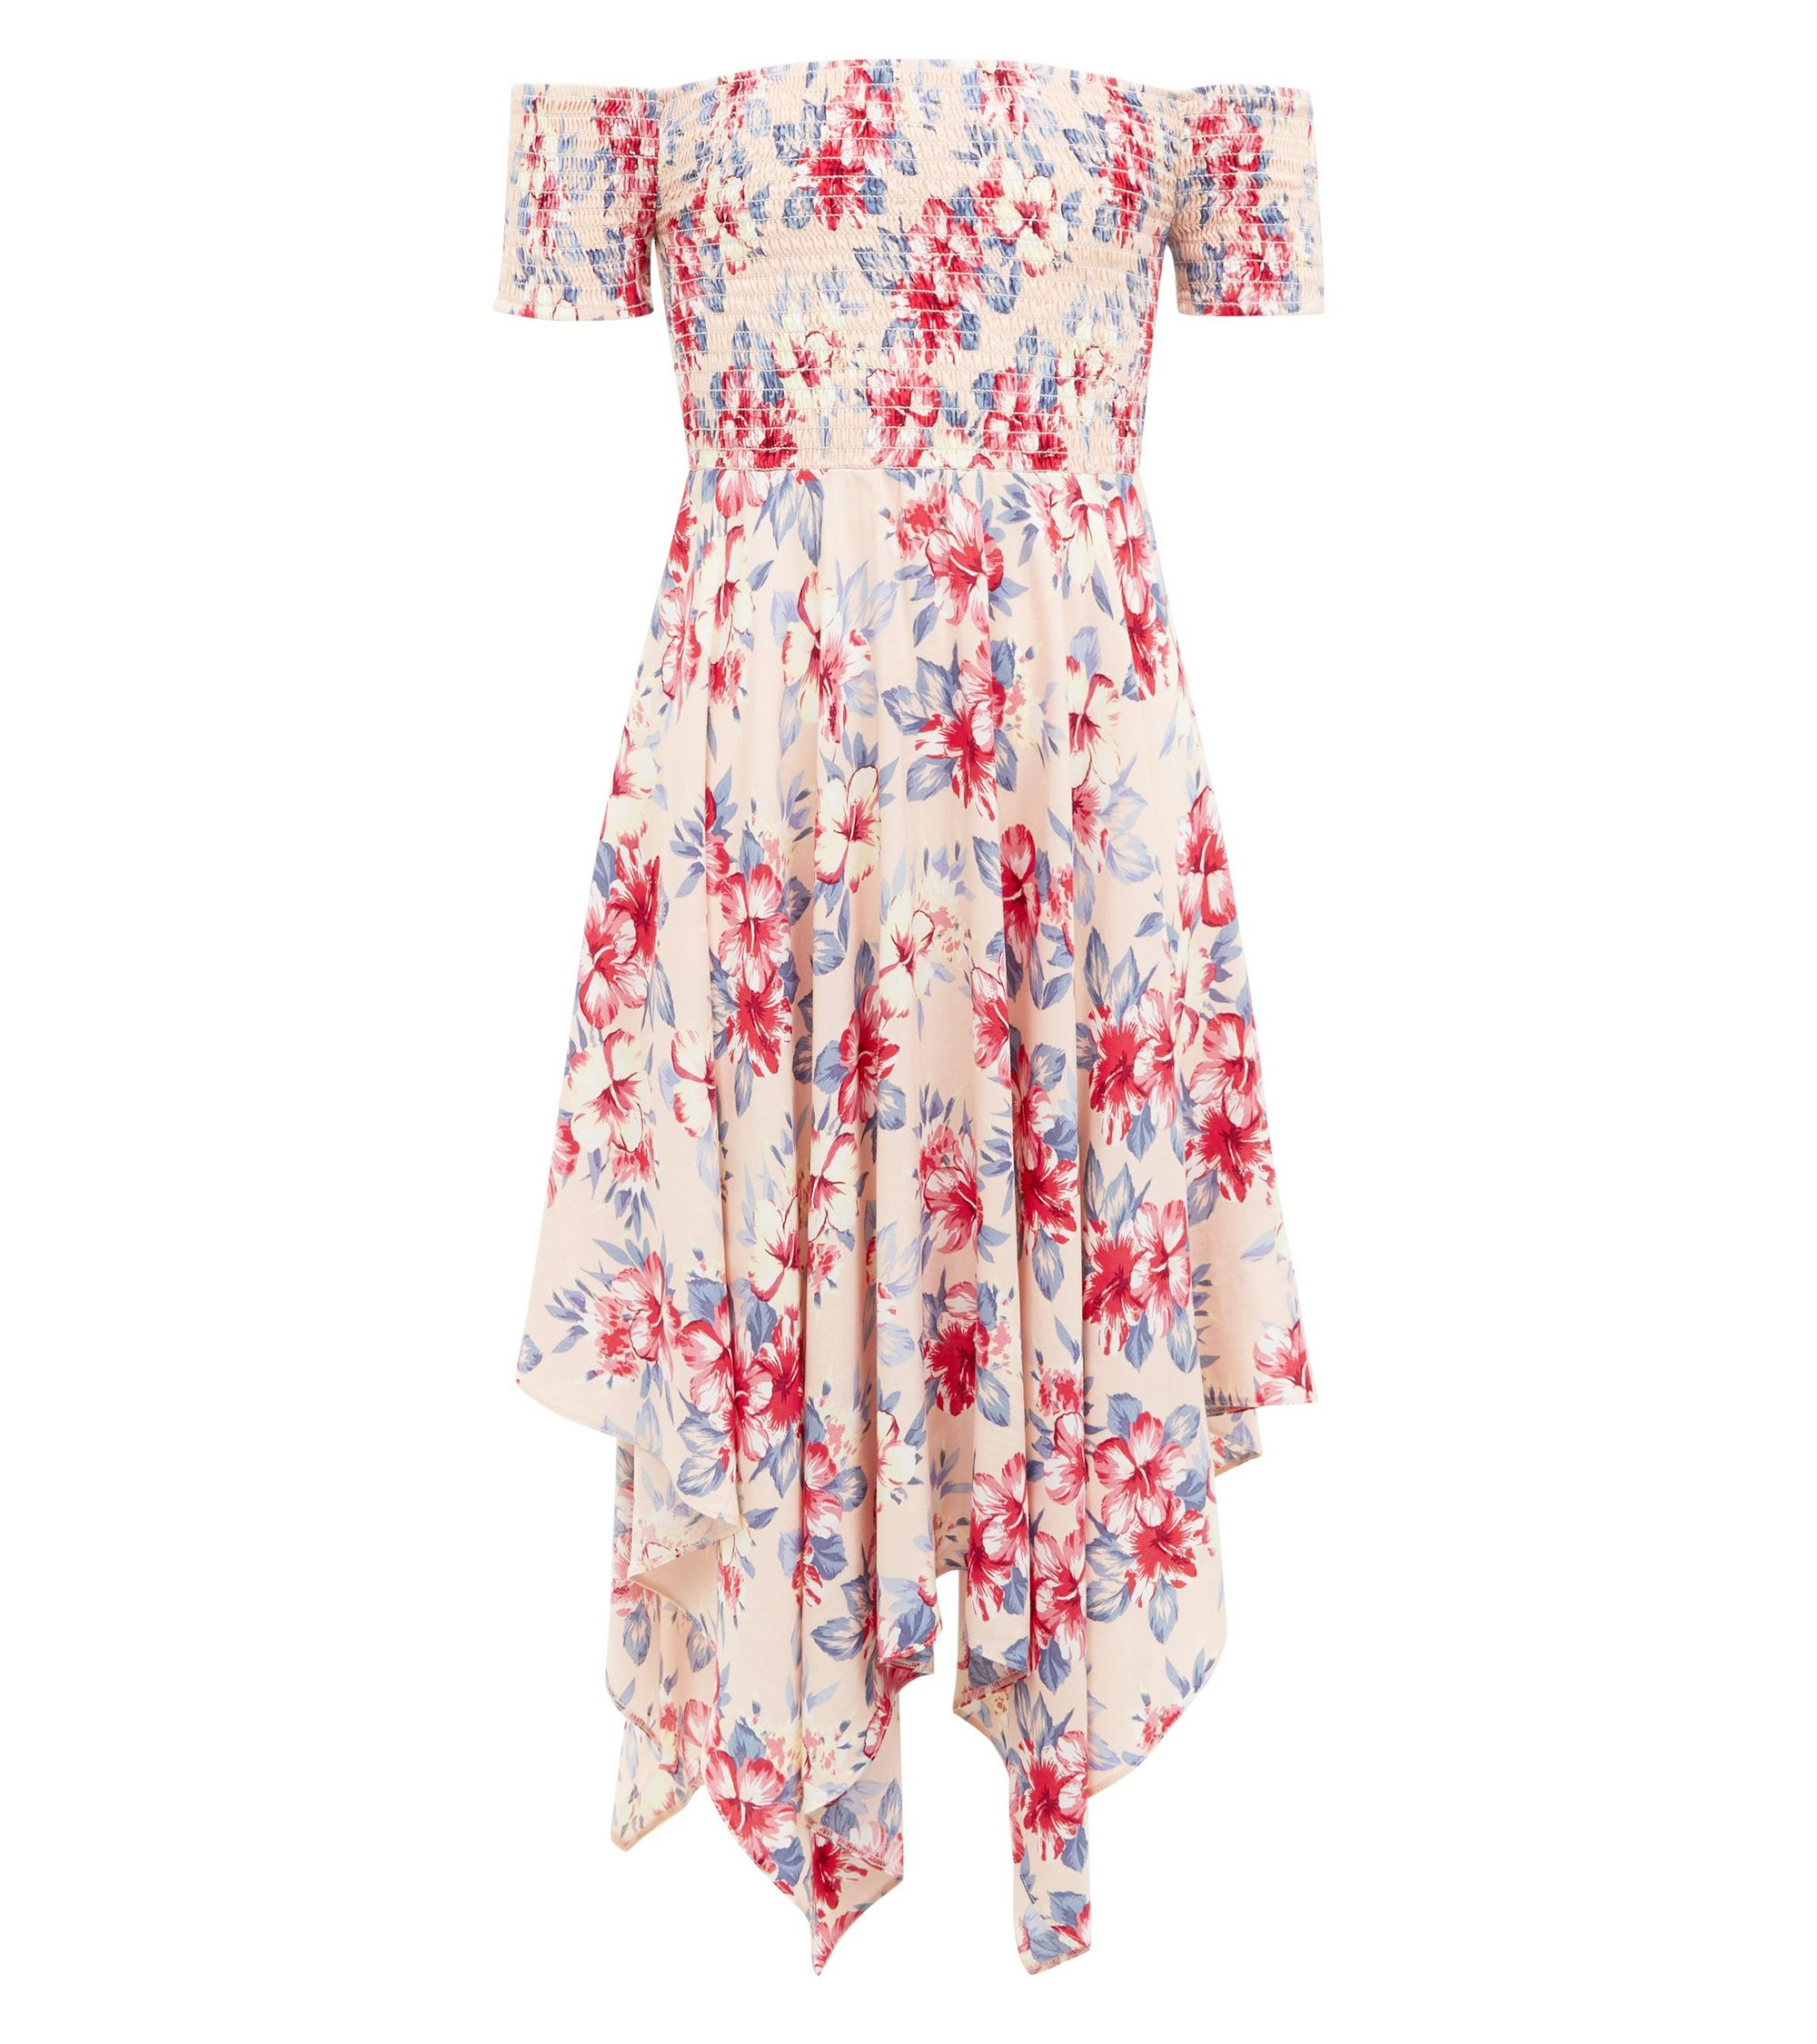 ade56148ae1d New Look Girls Pink Tropical Print Hanky Hem Bardot Dress at £19.99 ...